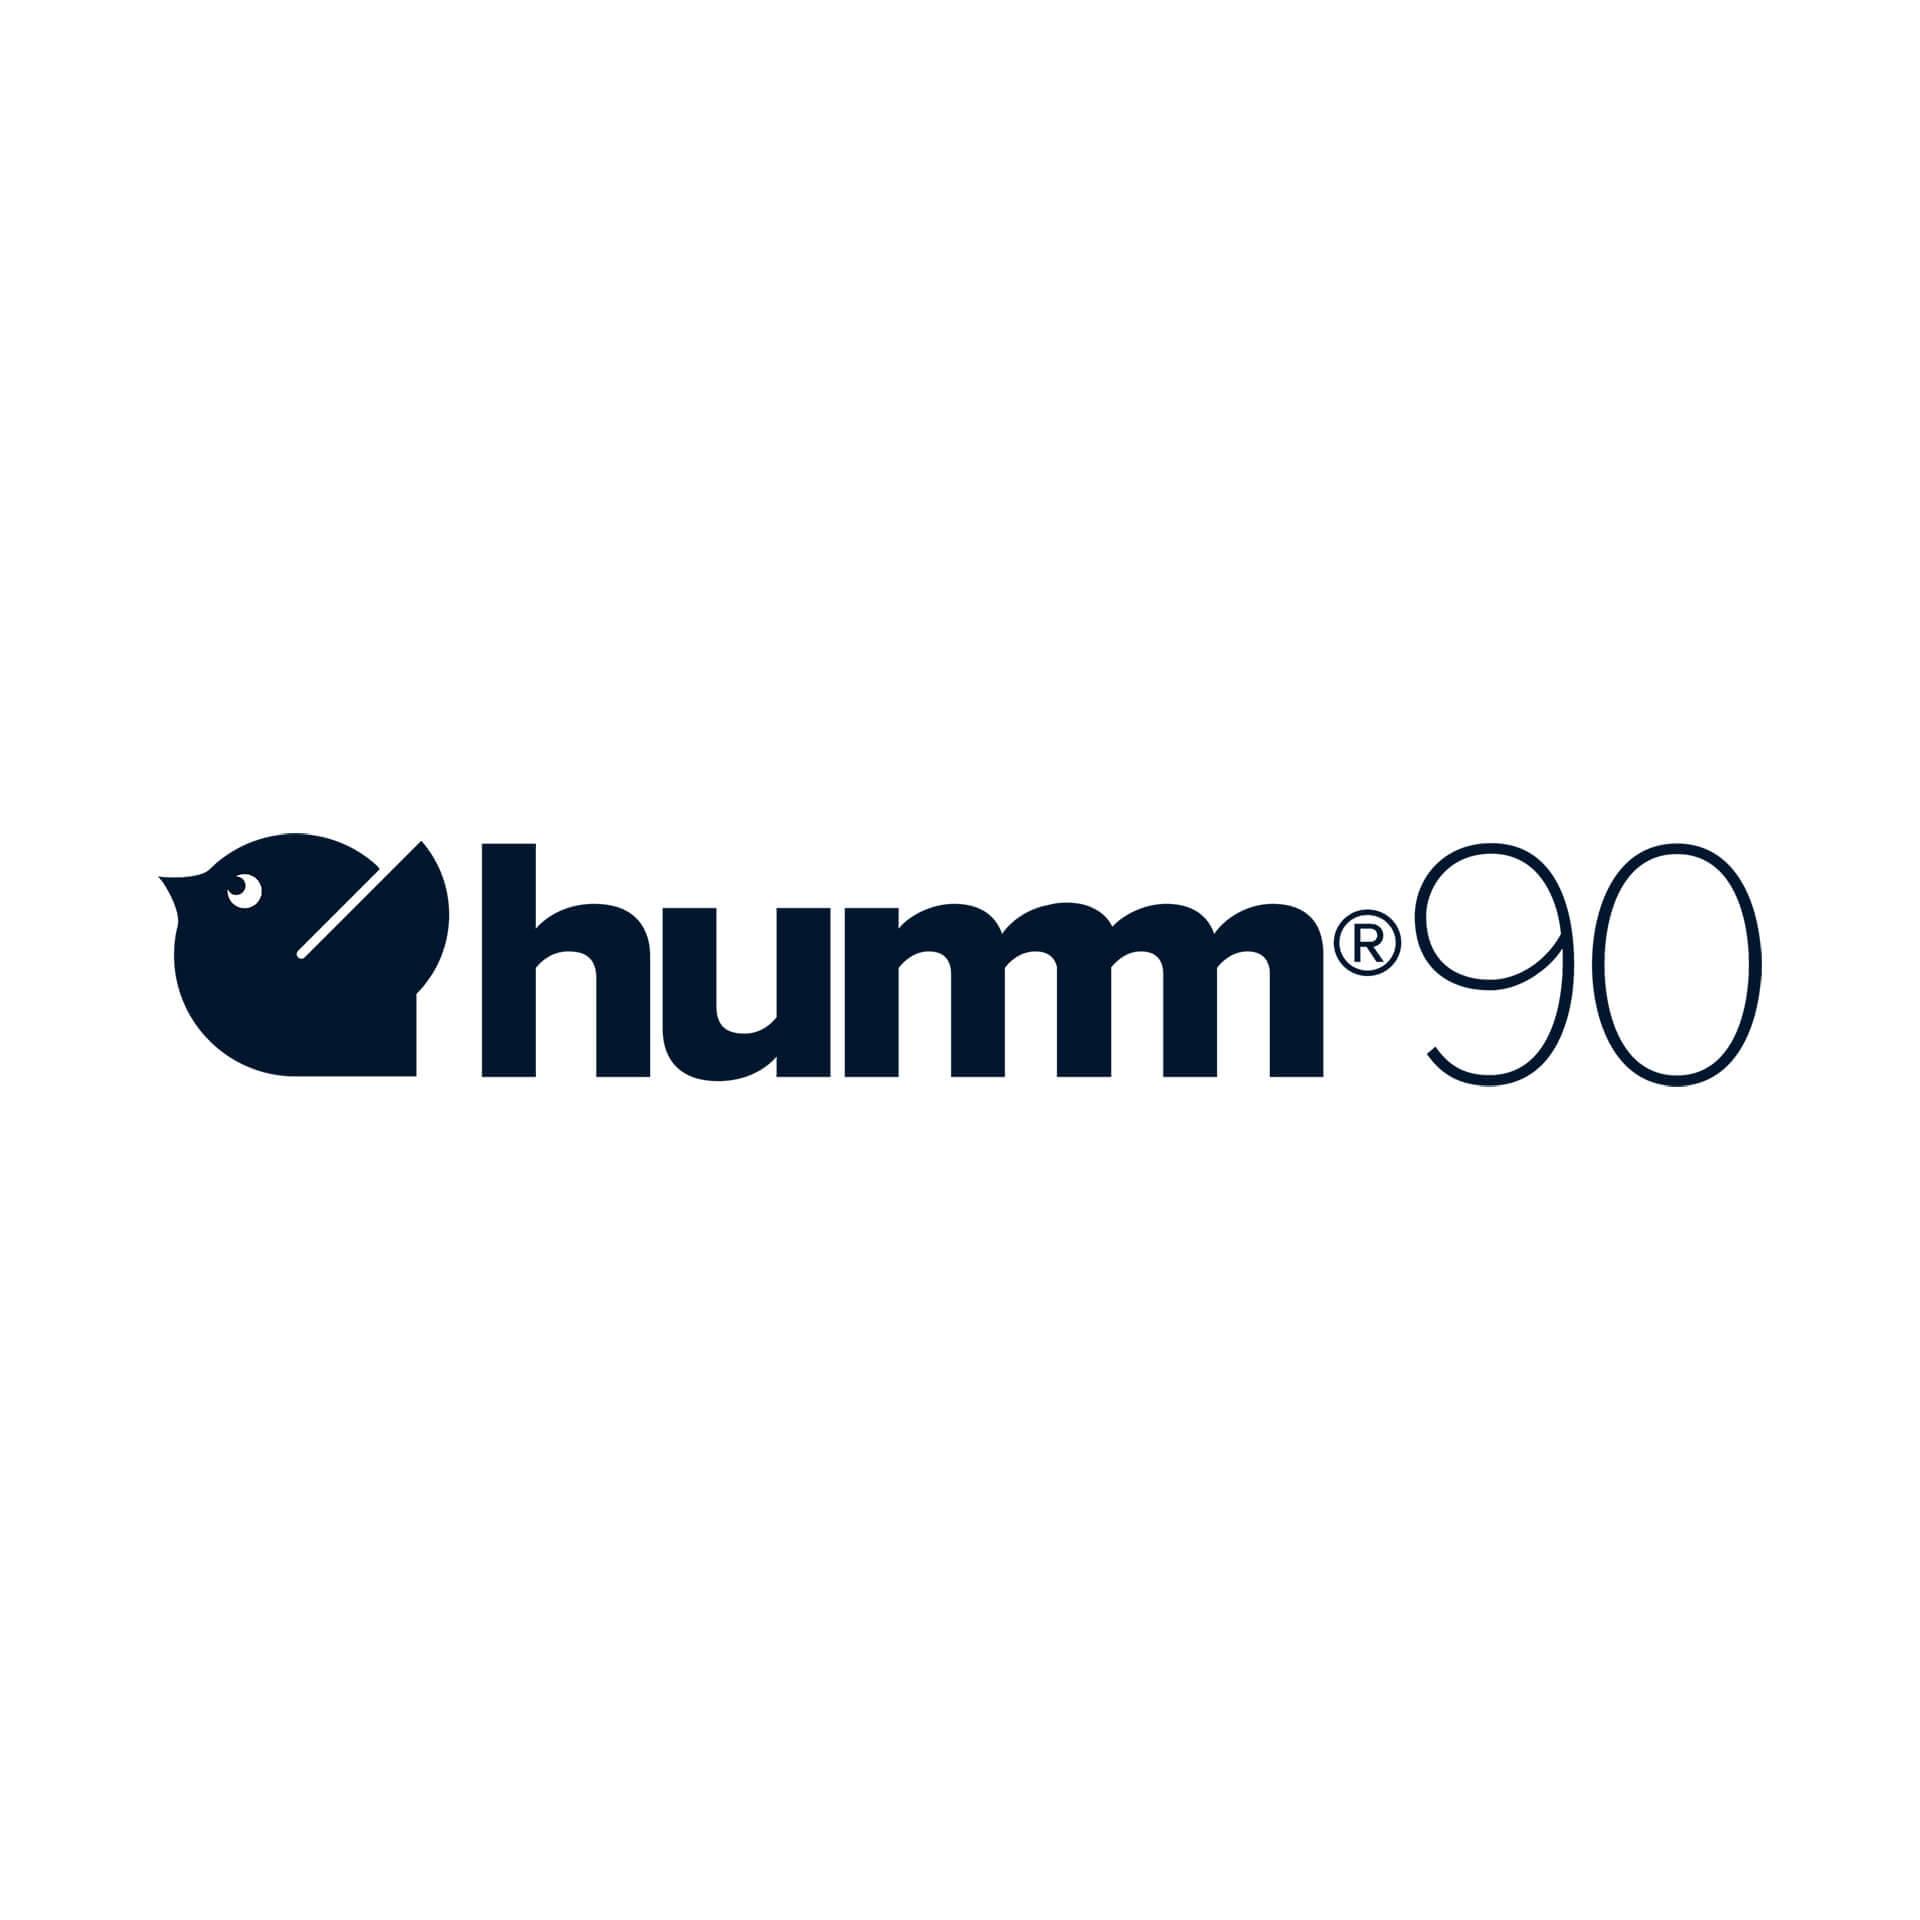 Humm7 Interest Free Shopping & Interest Free Credit Card Australia